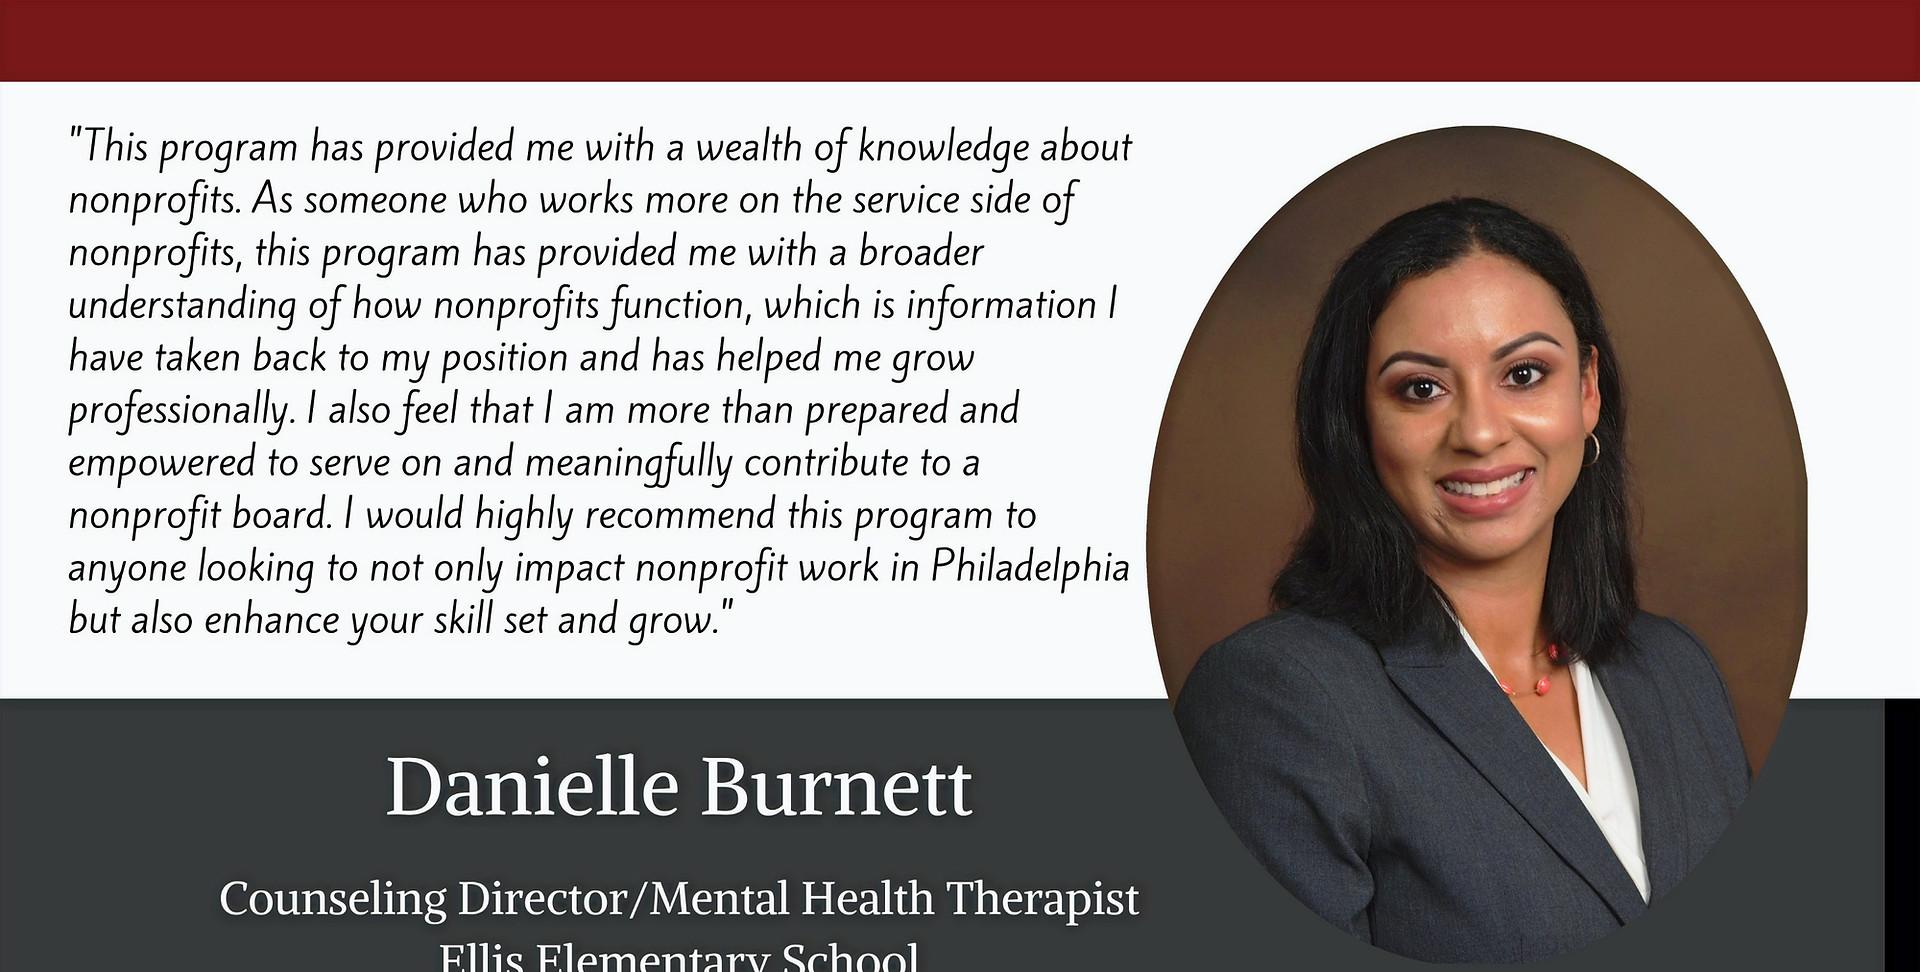 Daniella Burnett